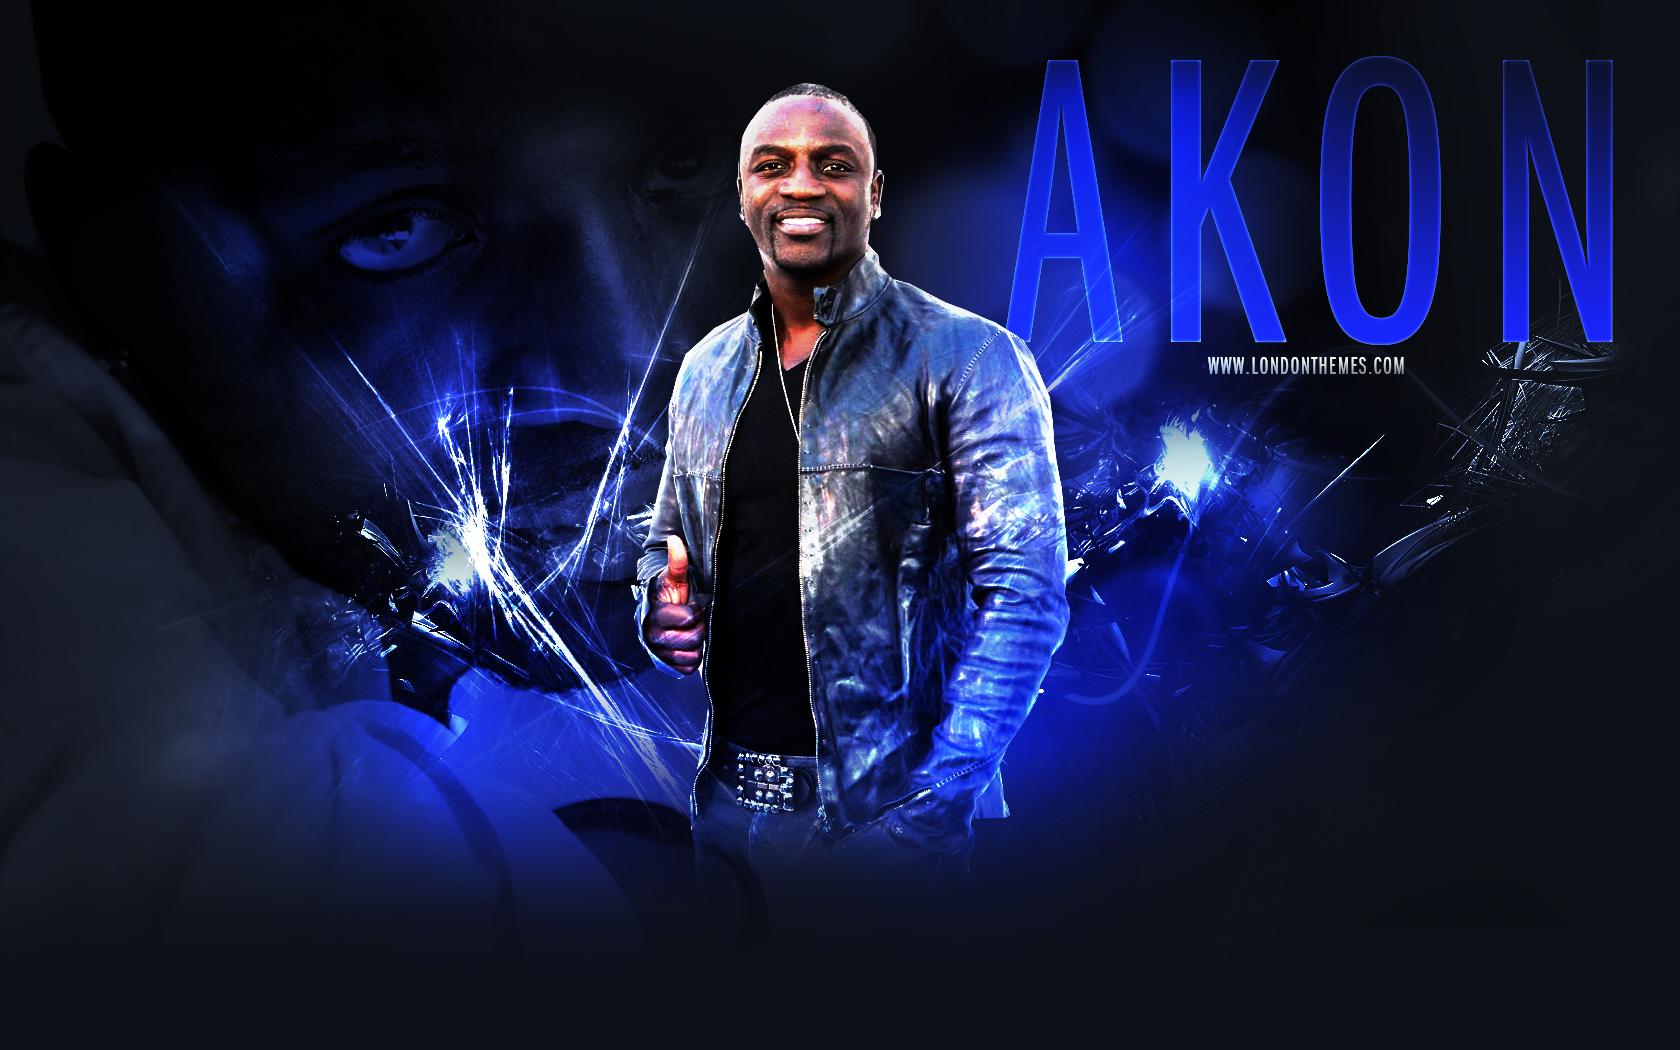 71+] Akon Wallpaper on WallpaperSafari